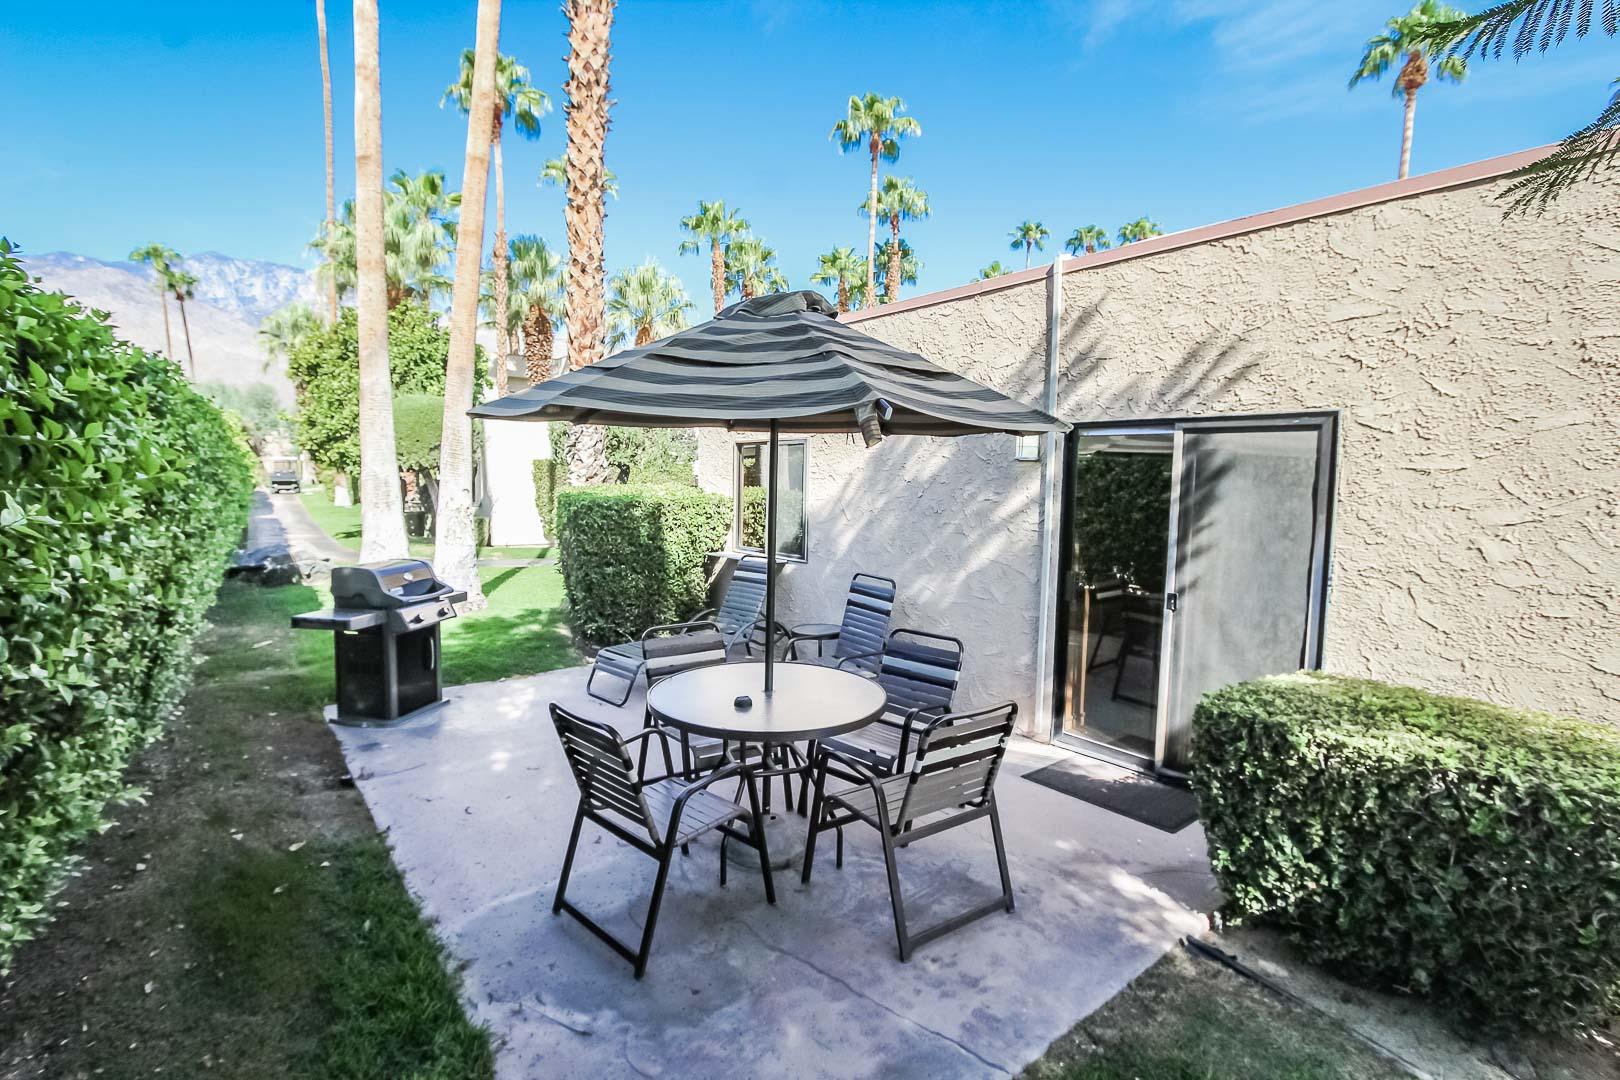 A peaceful patio area at VRI's Desert Isle Resort in California.